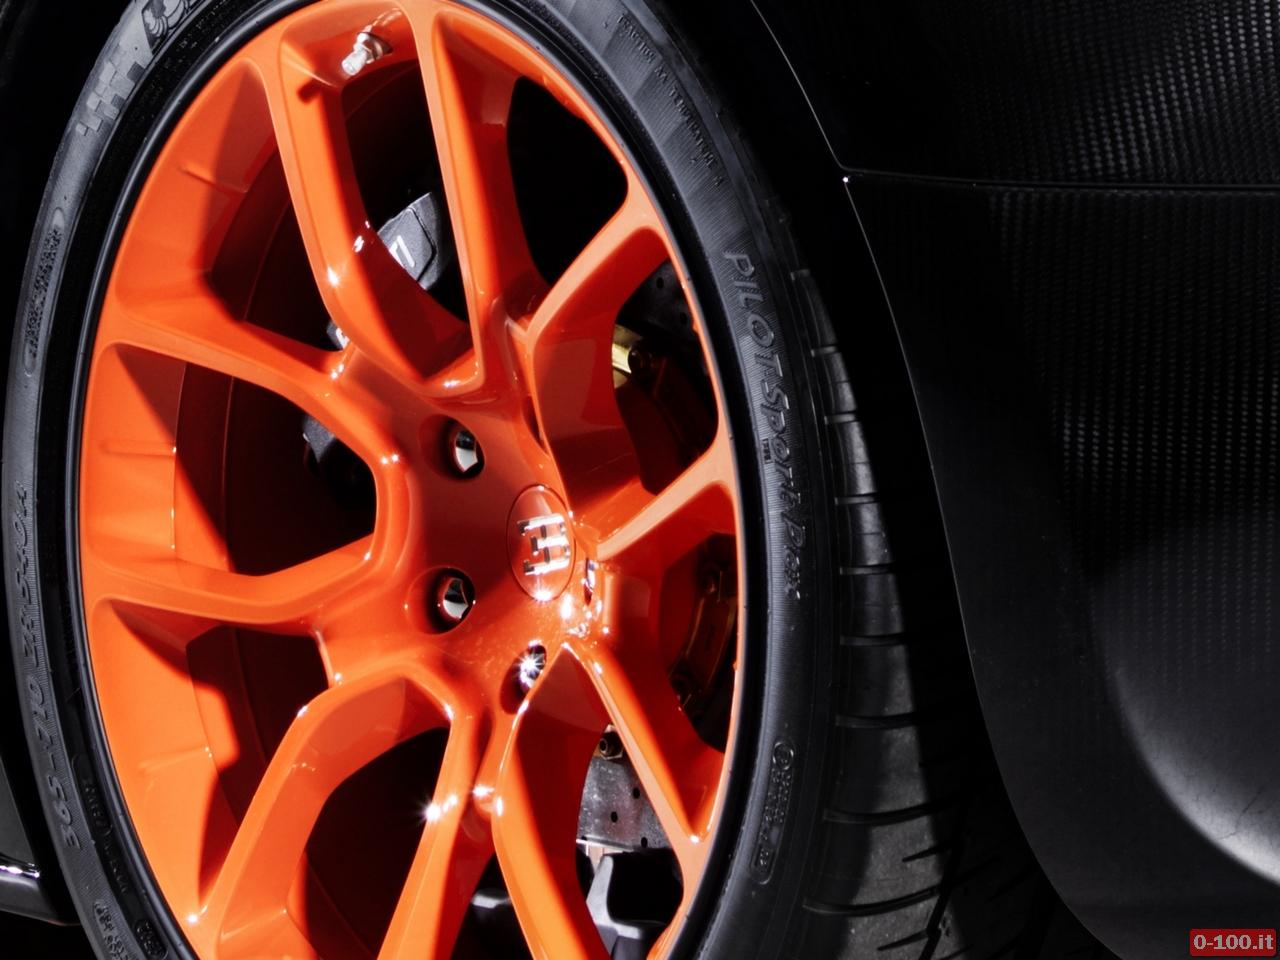 bugatti-veyron-16-4-grand-sport-vitesse-debutto-a-shanghai_0-100_16